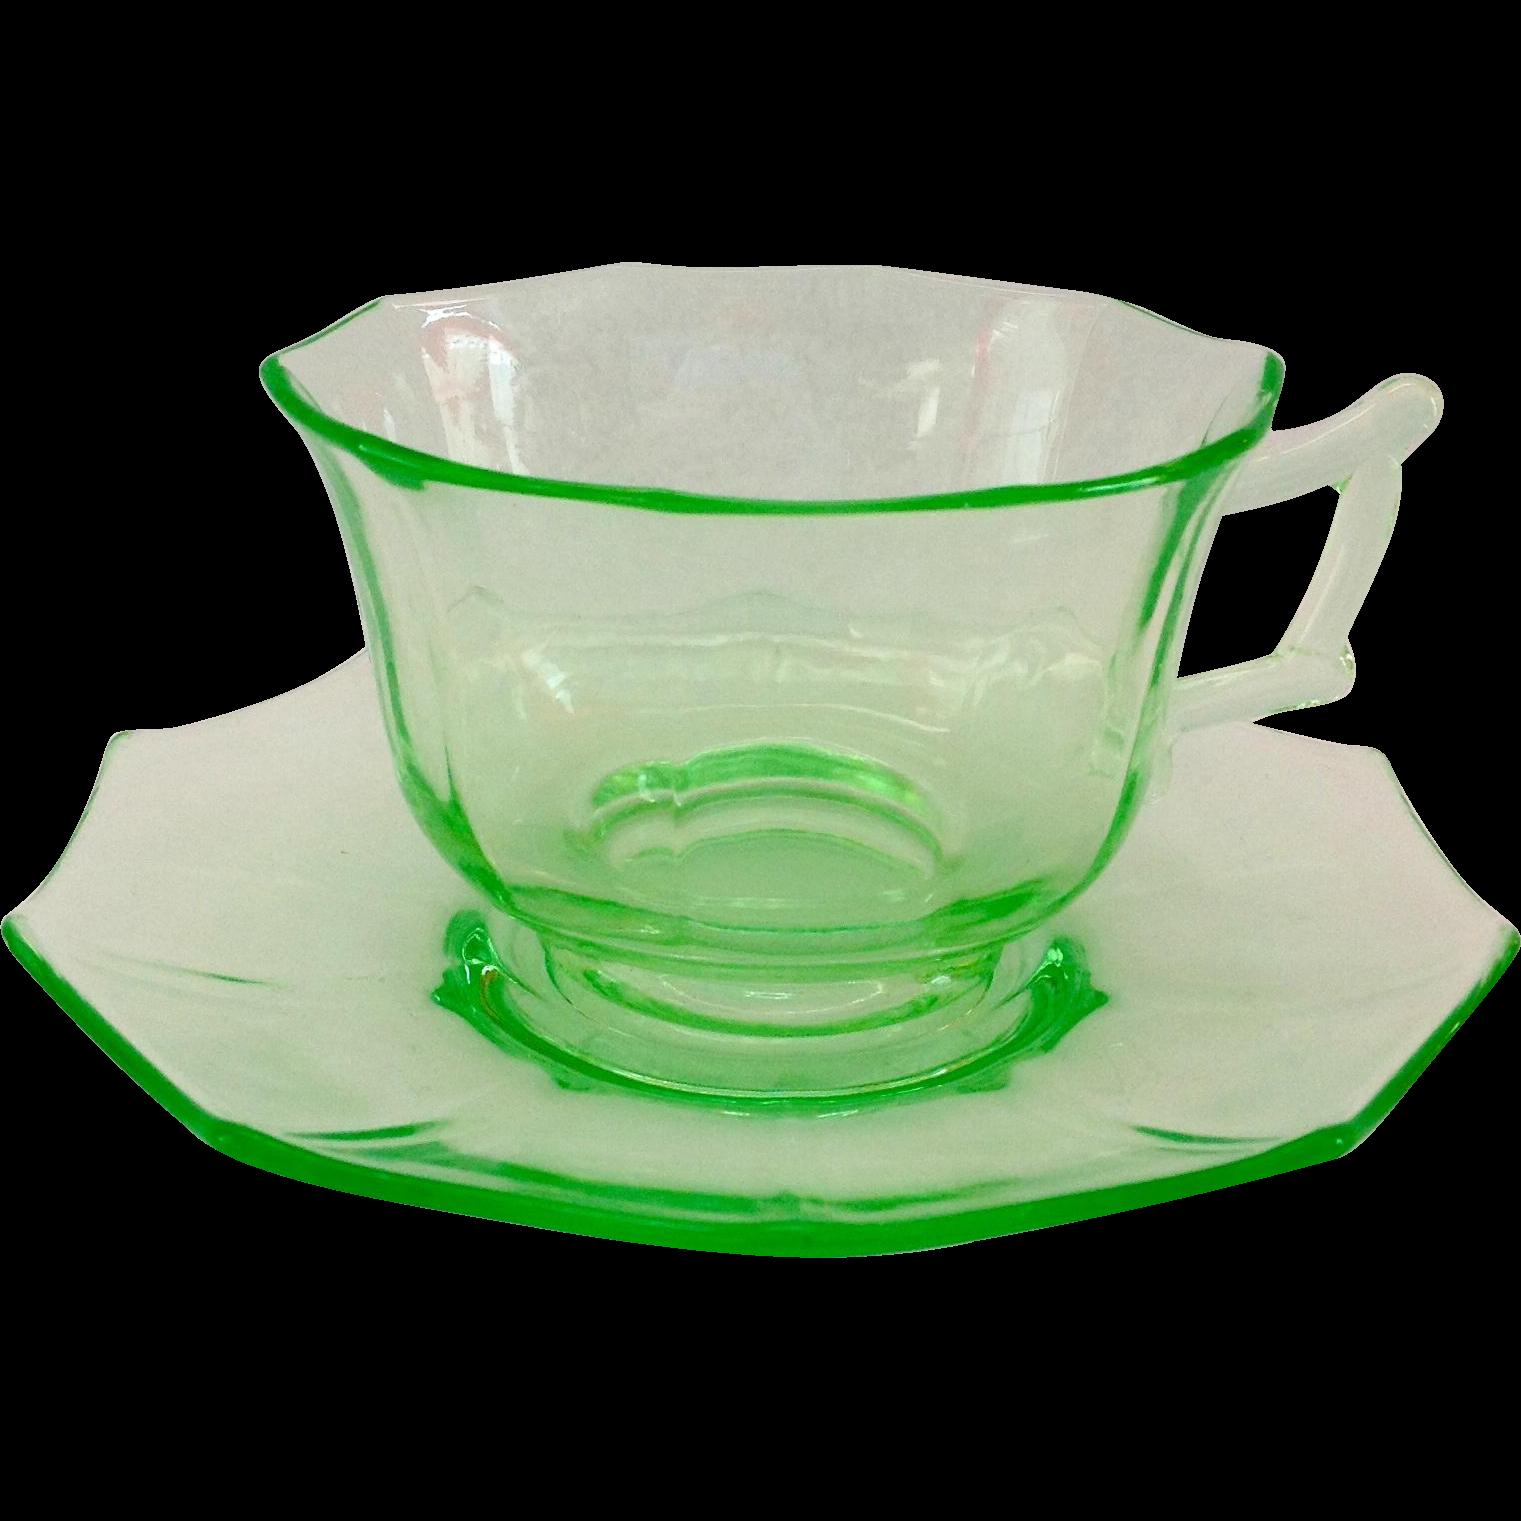 Cambridge Decagon Emerald Green Elegant Glass Depression Era Cup and Saucer